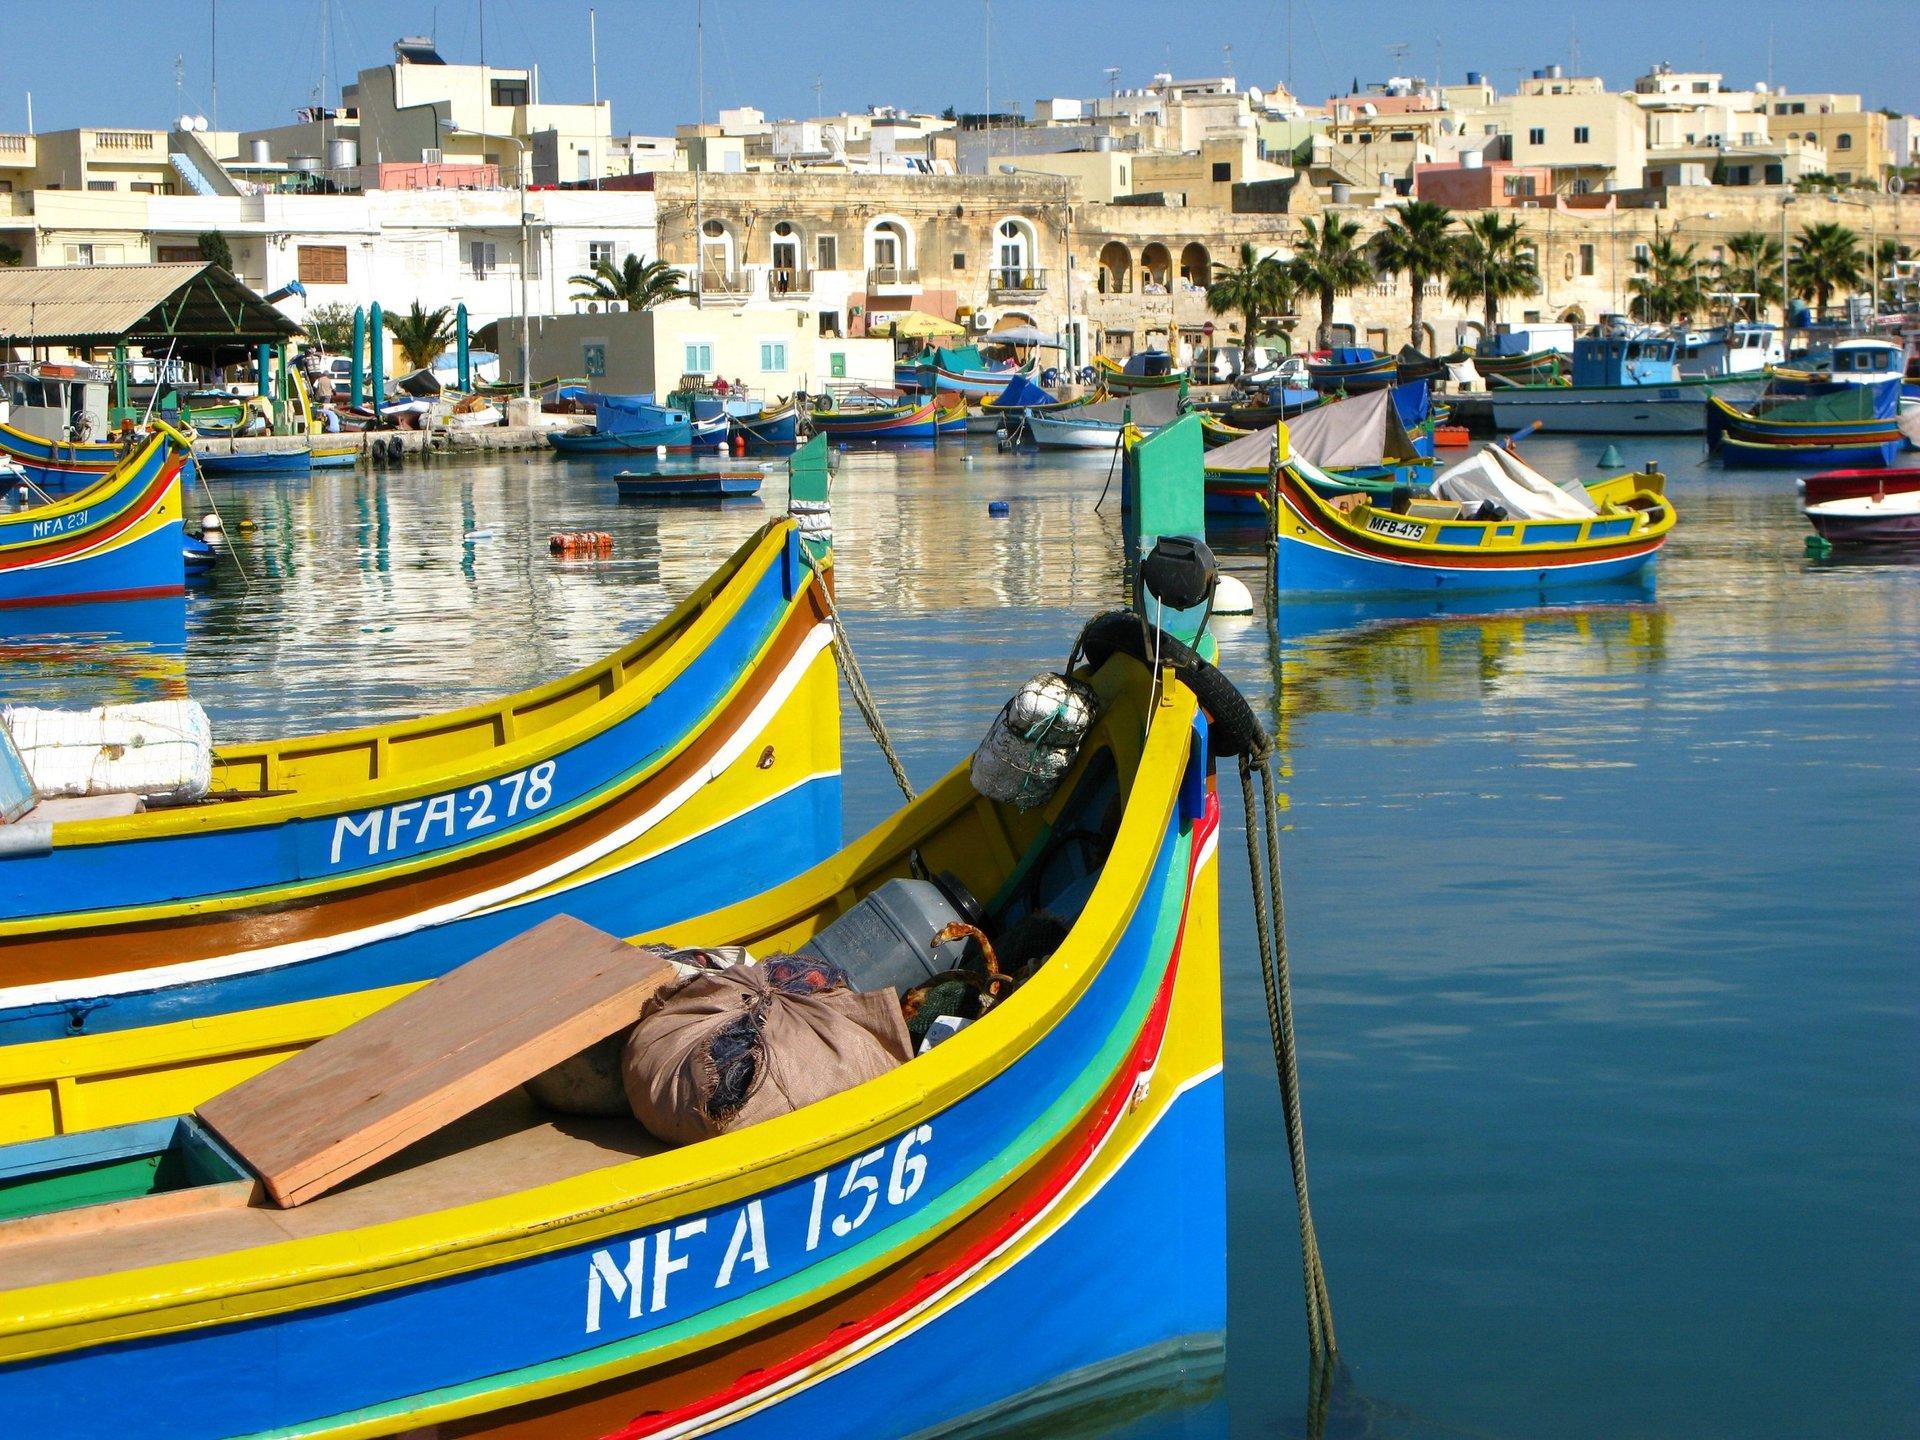 Traditionele boten in Marsaxlokk - Malta